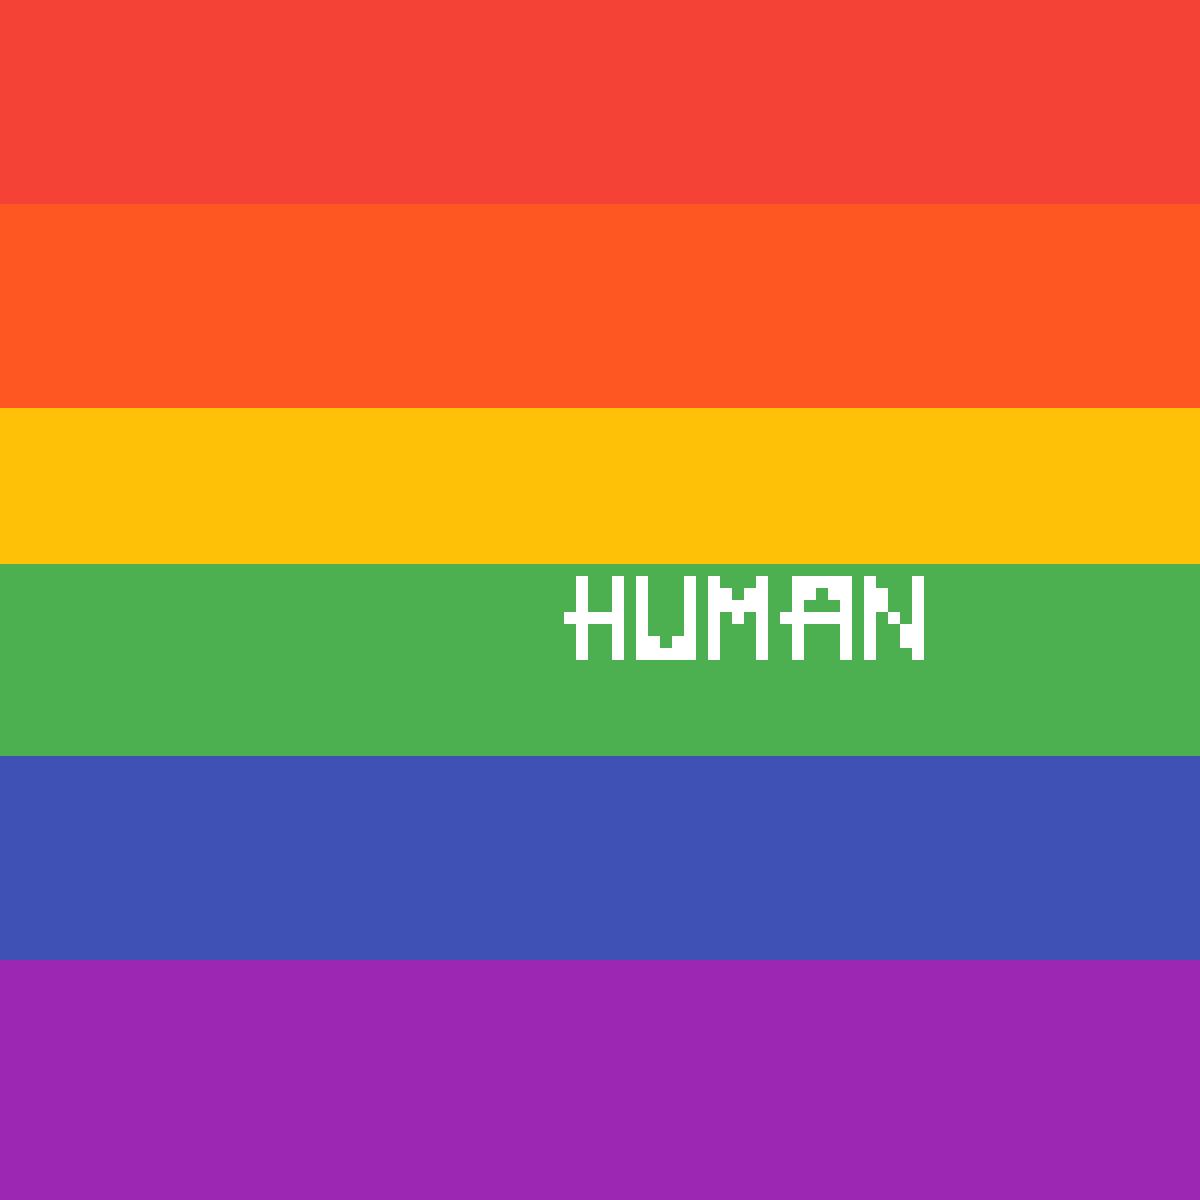 main-image-Human  by Caramel